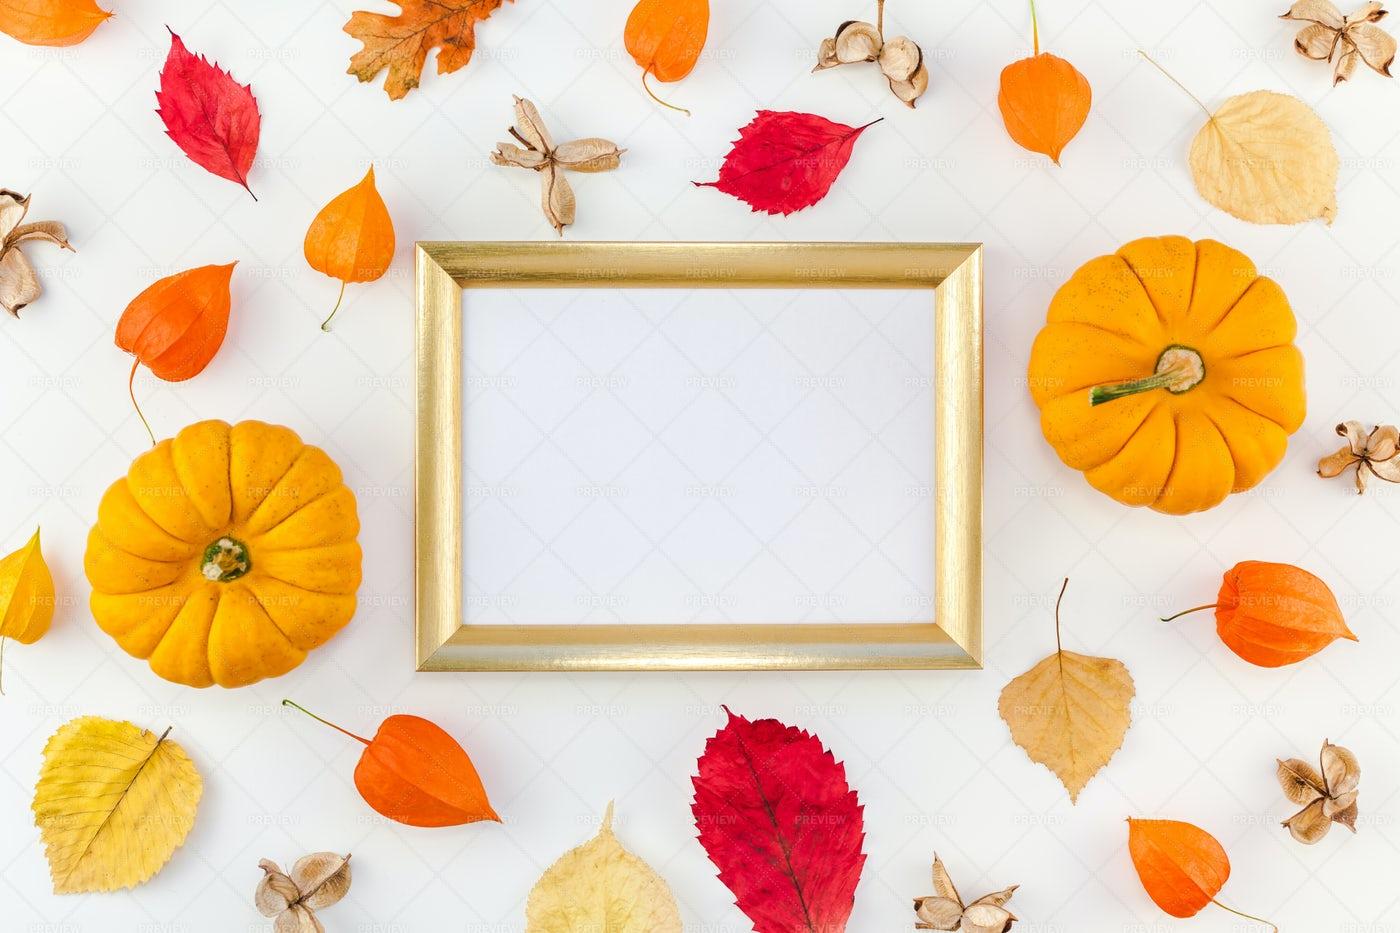 Autumn Frame: Stock Photos